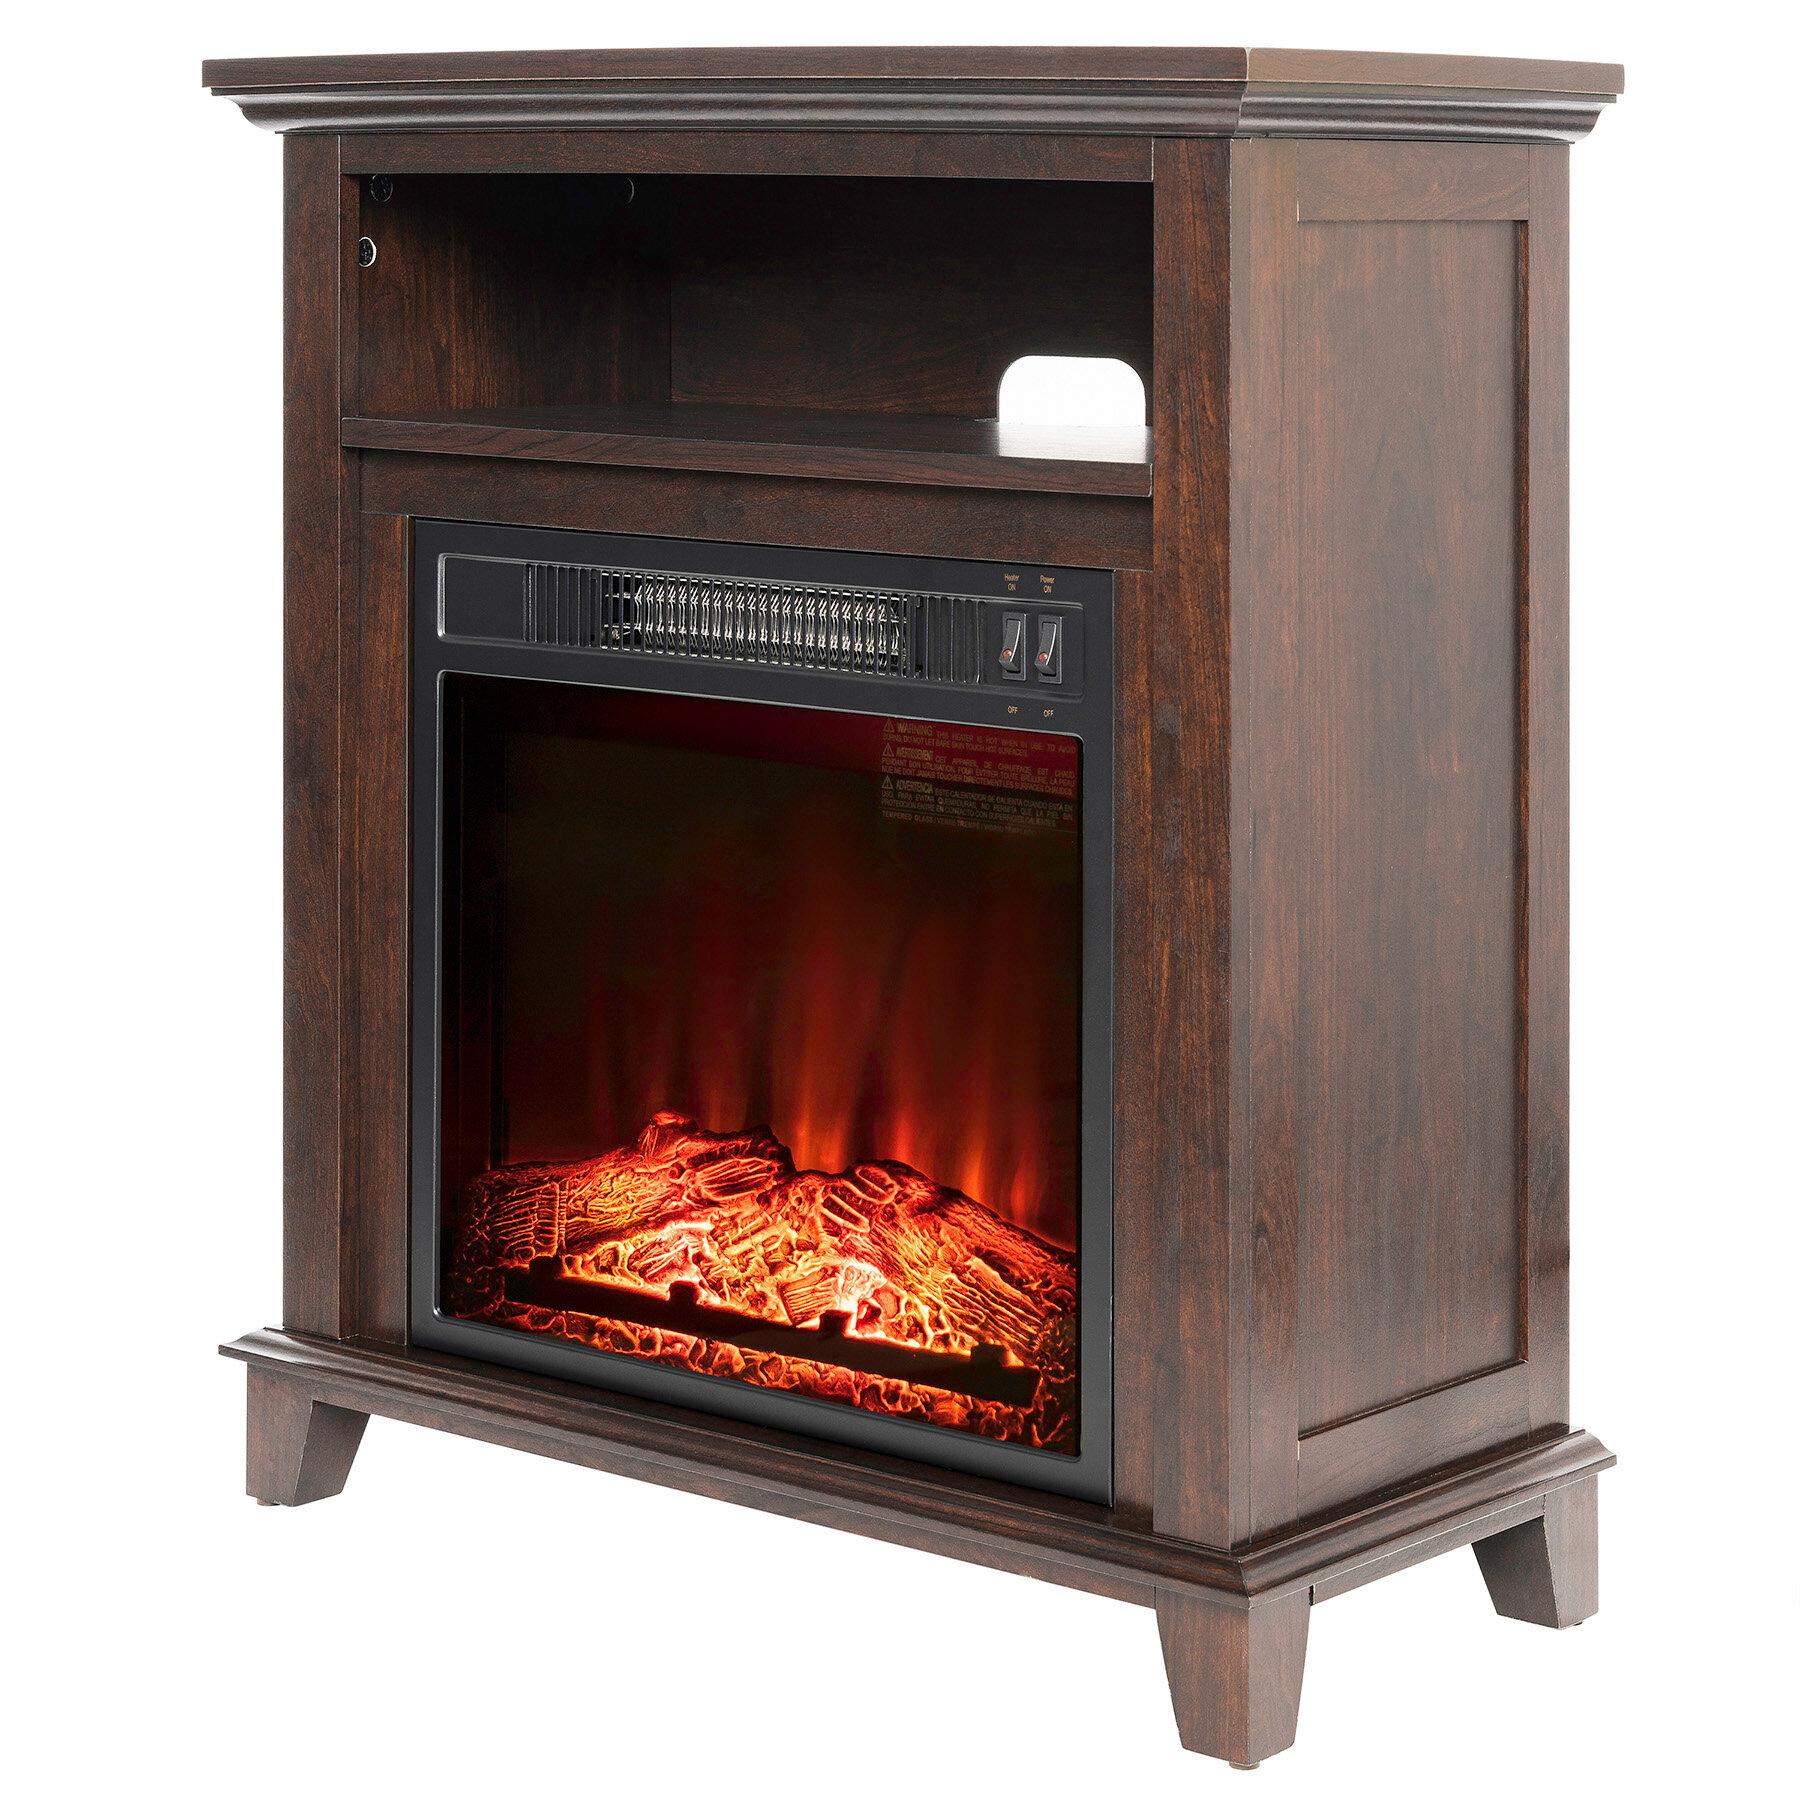 Charlton Home Gilbertson Wood Mantel Electric Fireplace Reviews